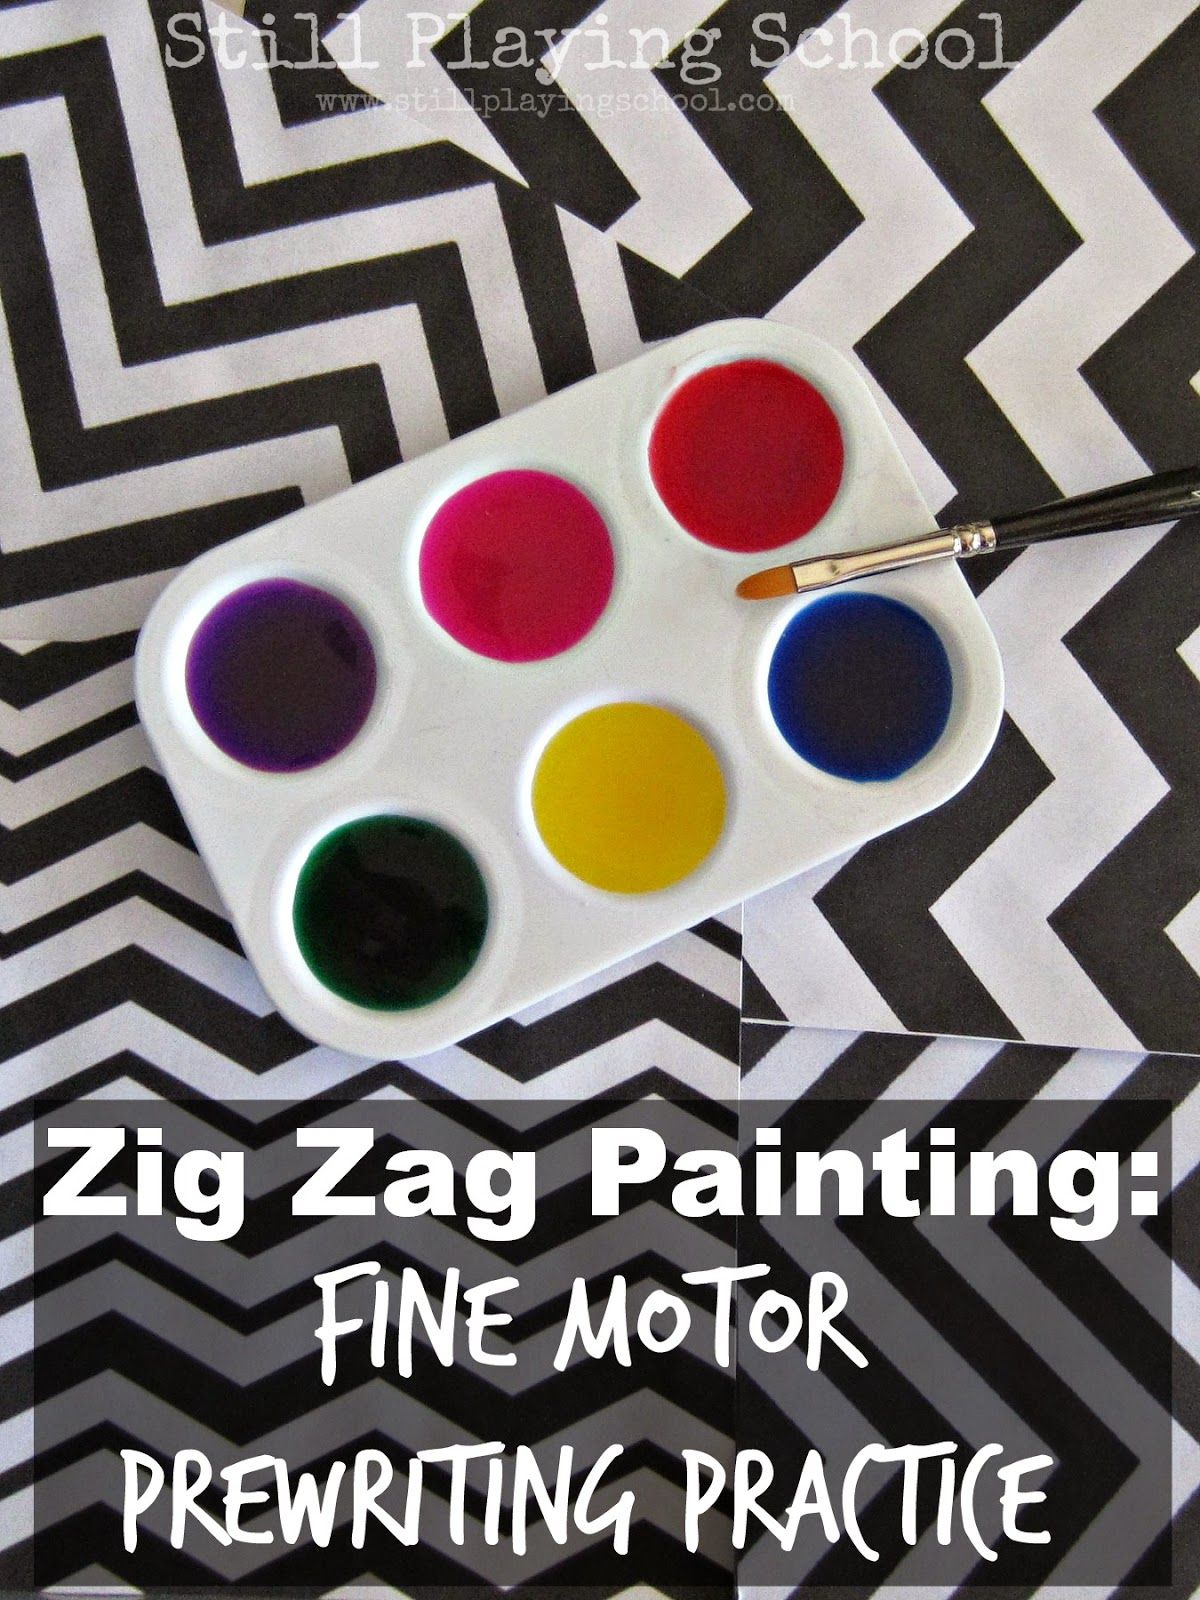 Zig Zag Painting